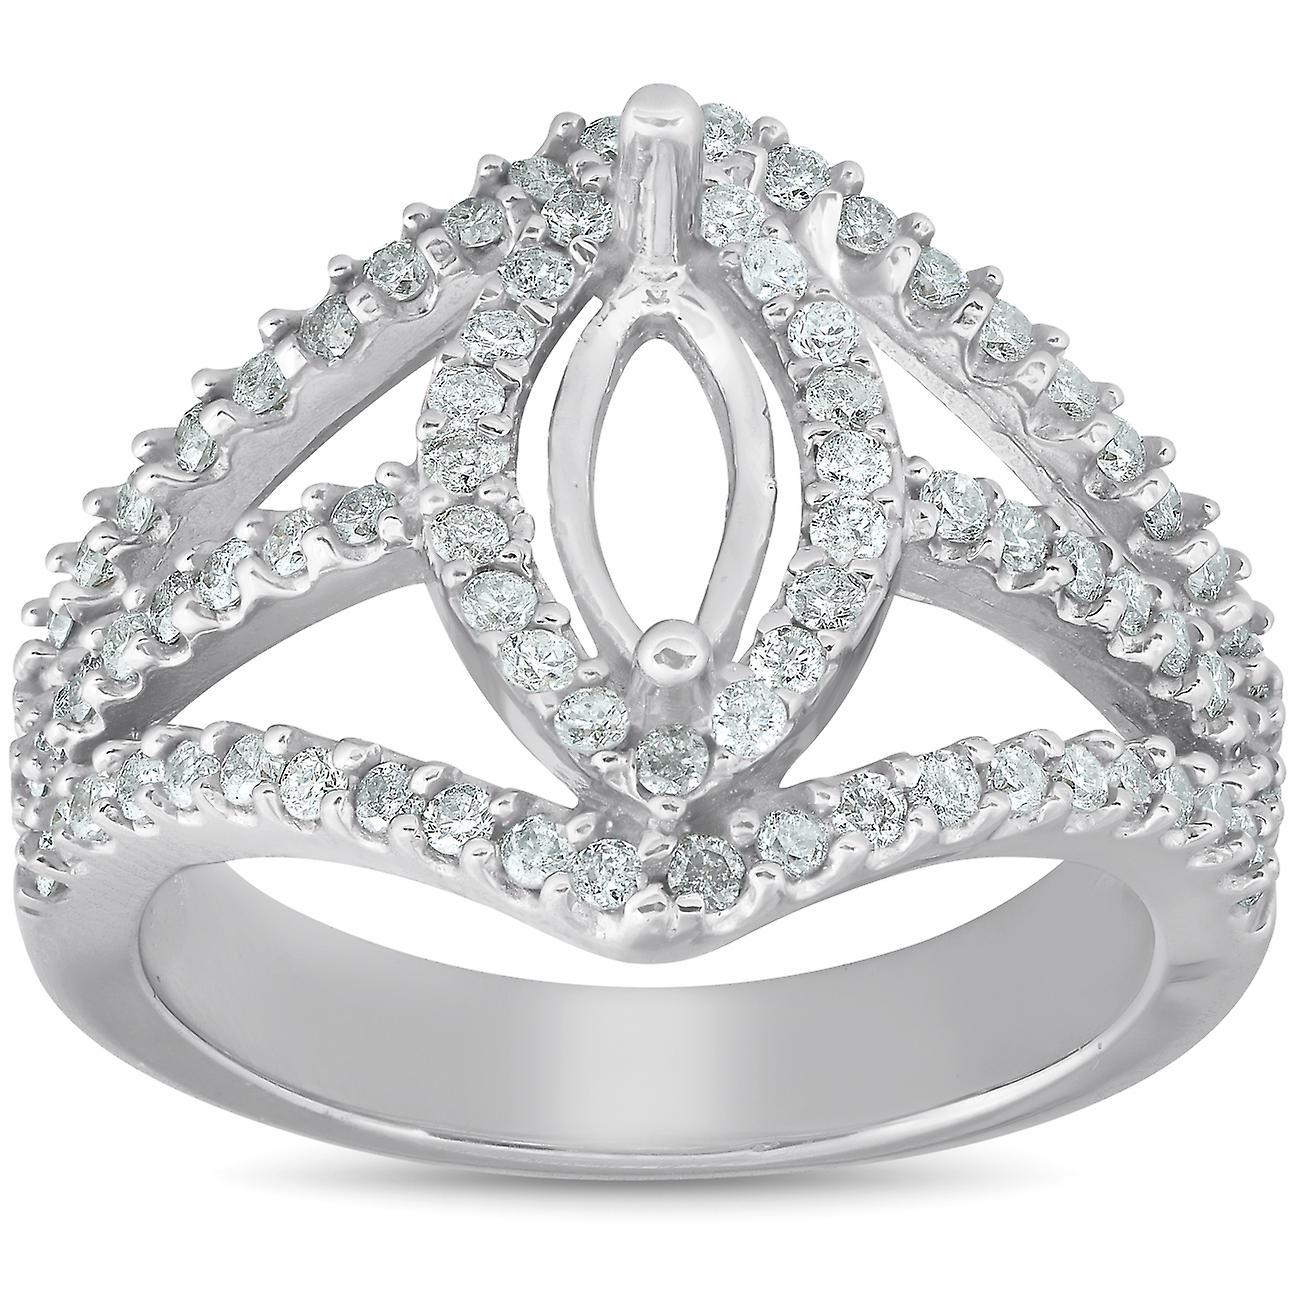 7 8 Ct Diamond EngageHommest Marquise Setting 14k blanc or Halo Mounting